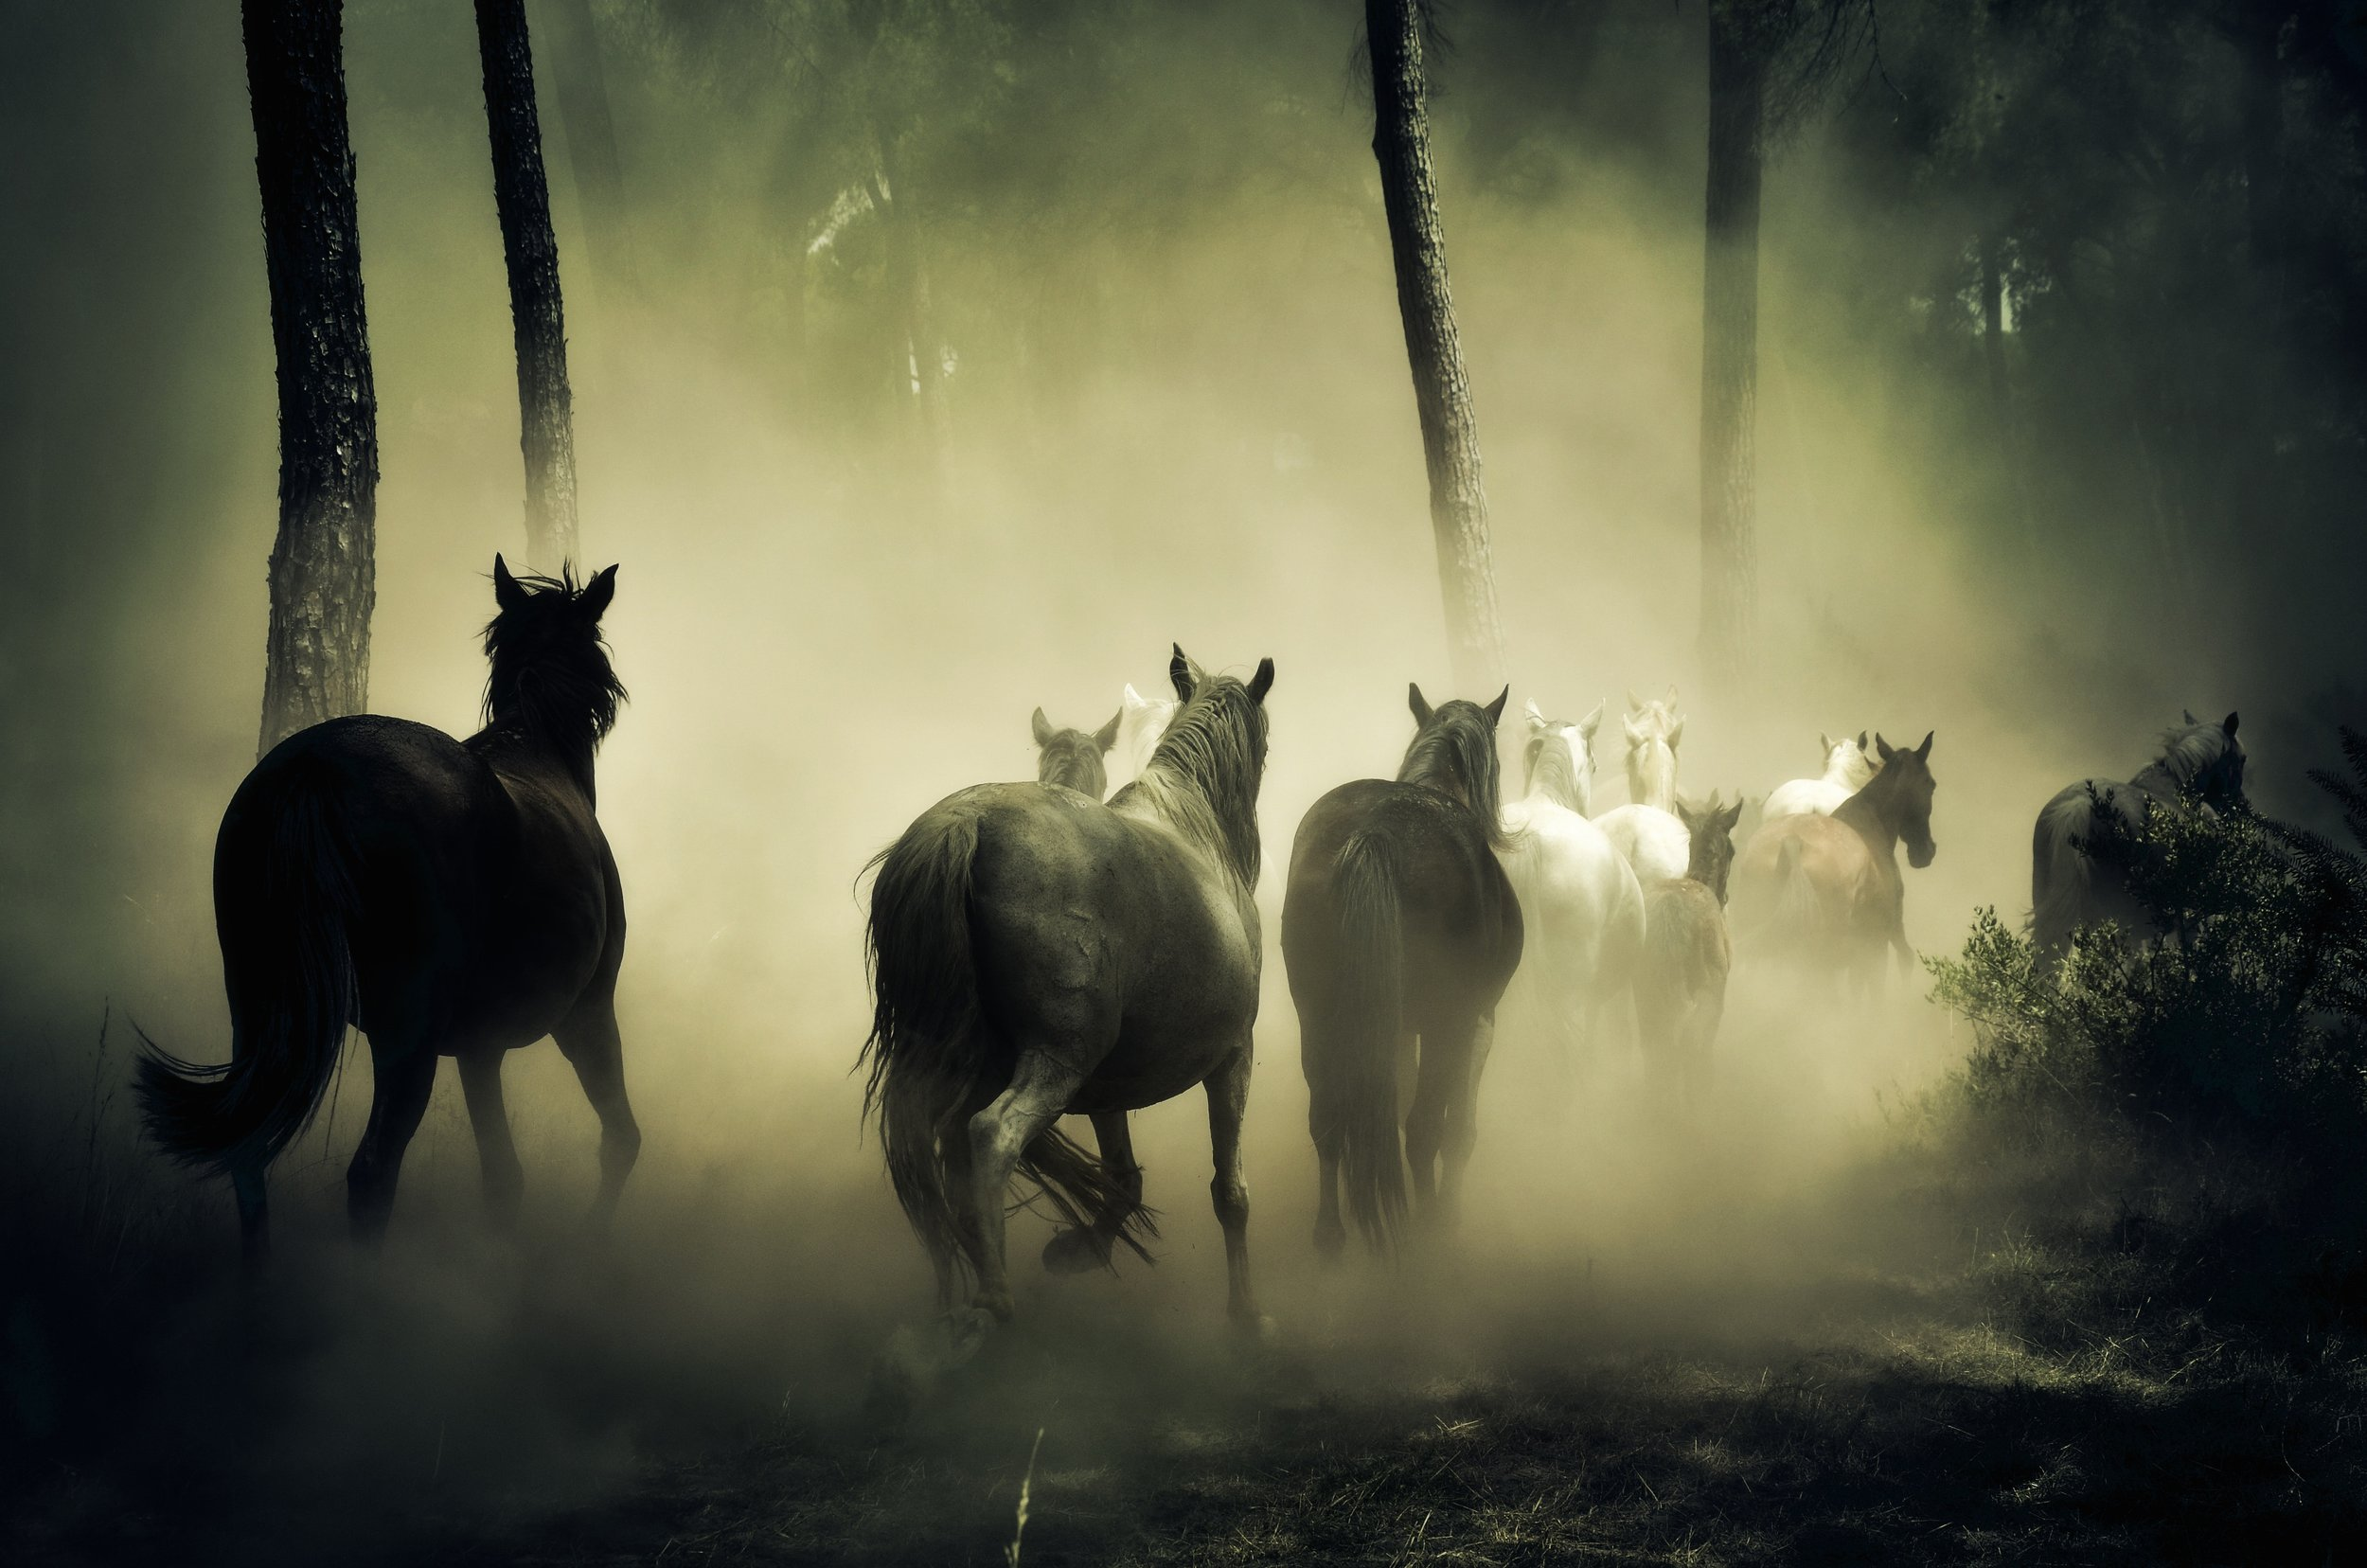 animals-fog-forest-219943.jpg